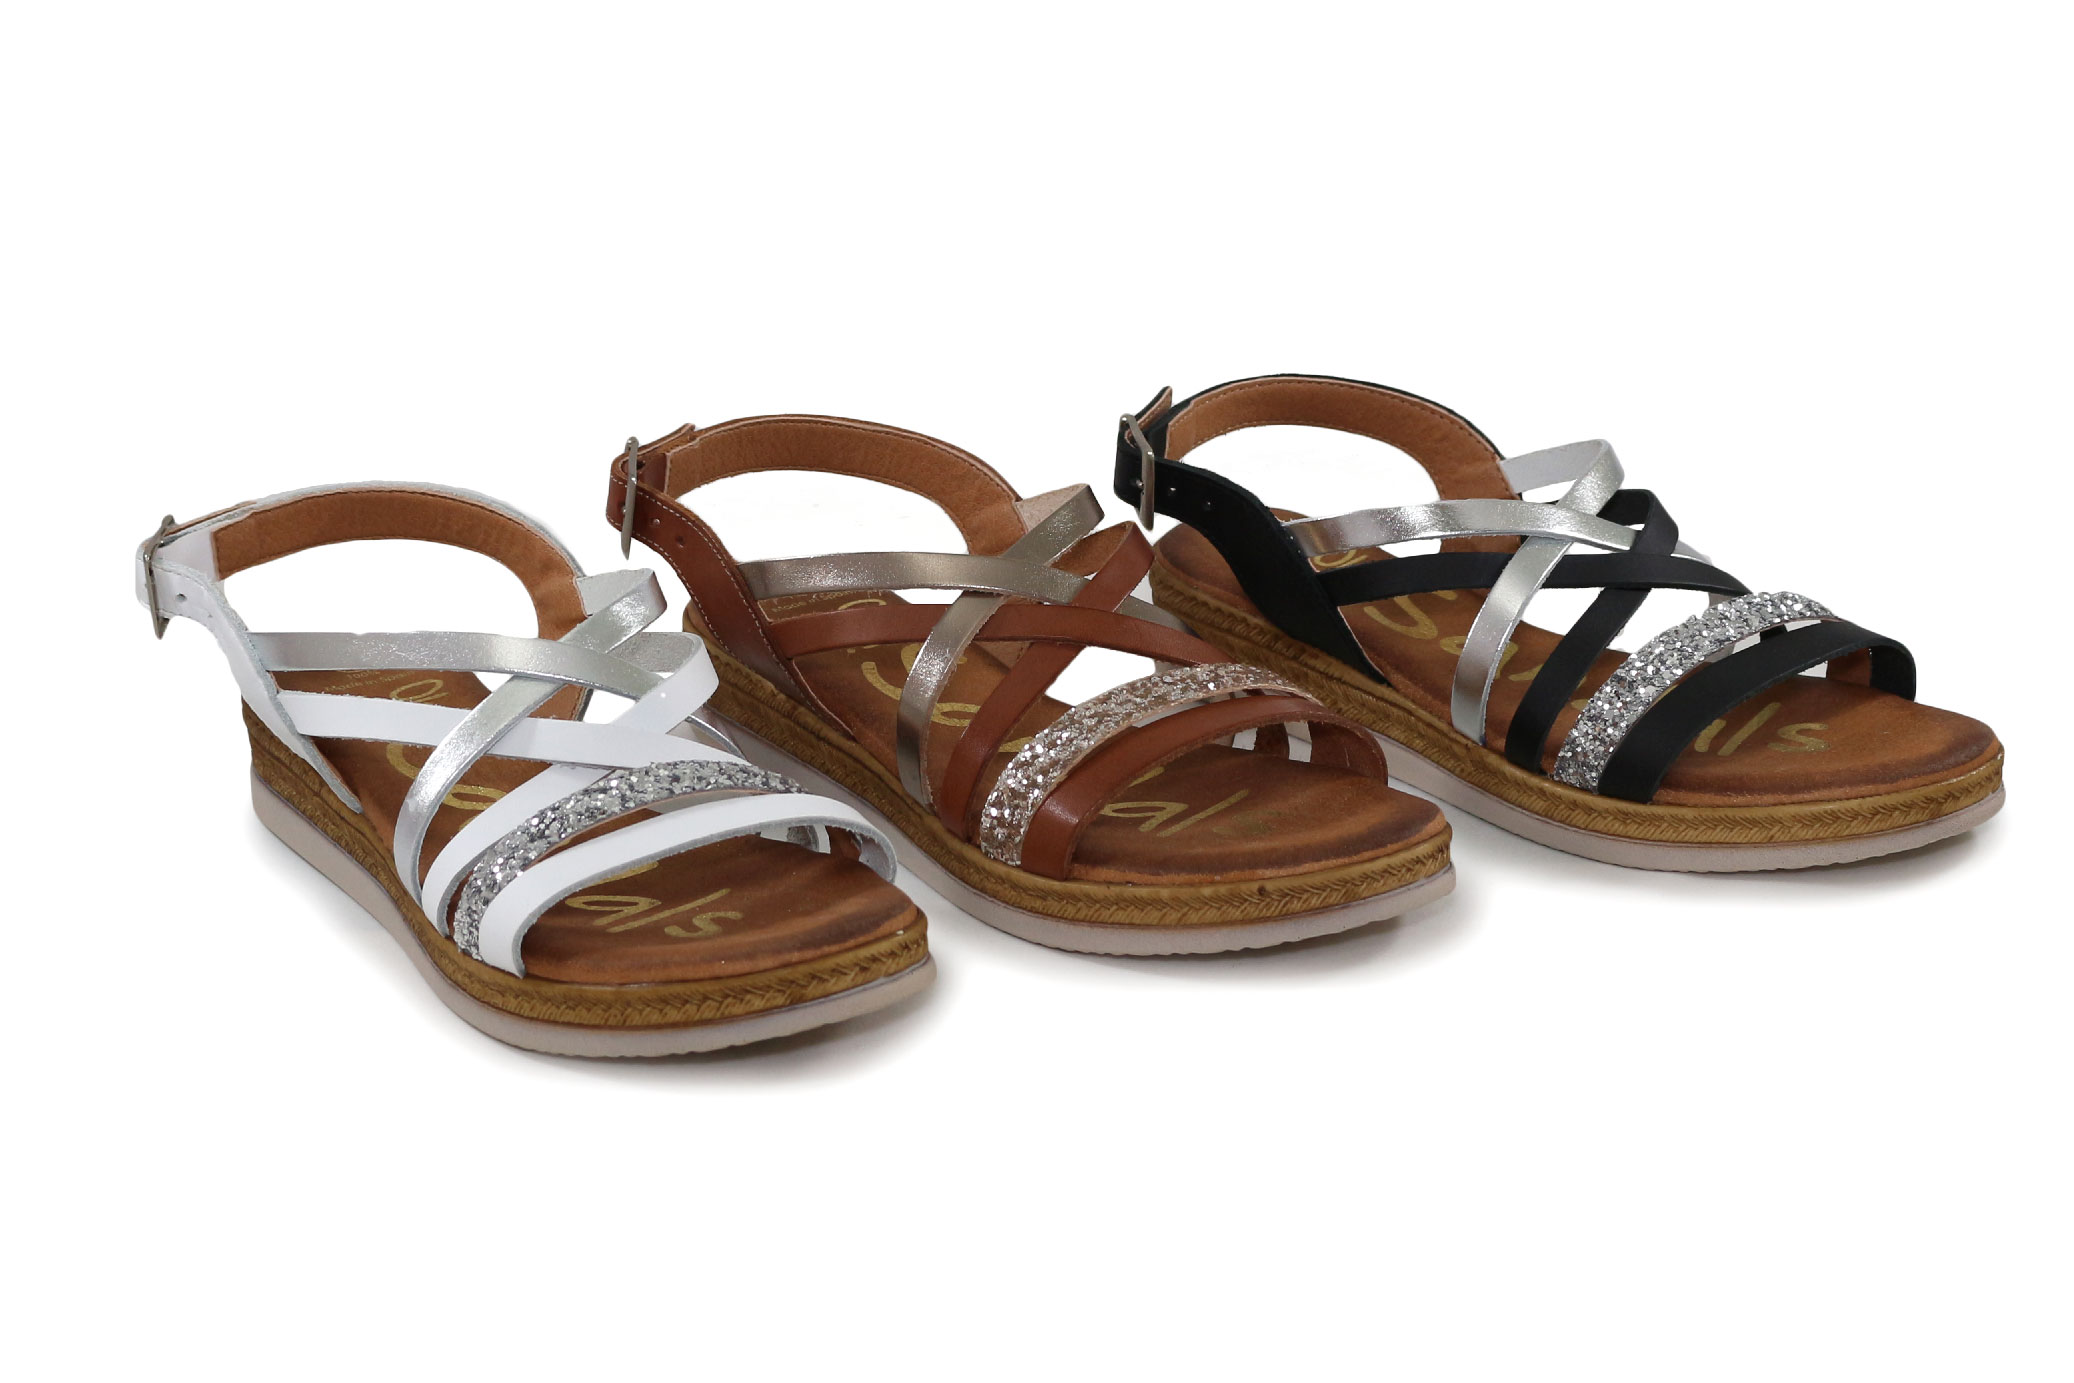 Sandalia Oh My Sandals 3630